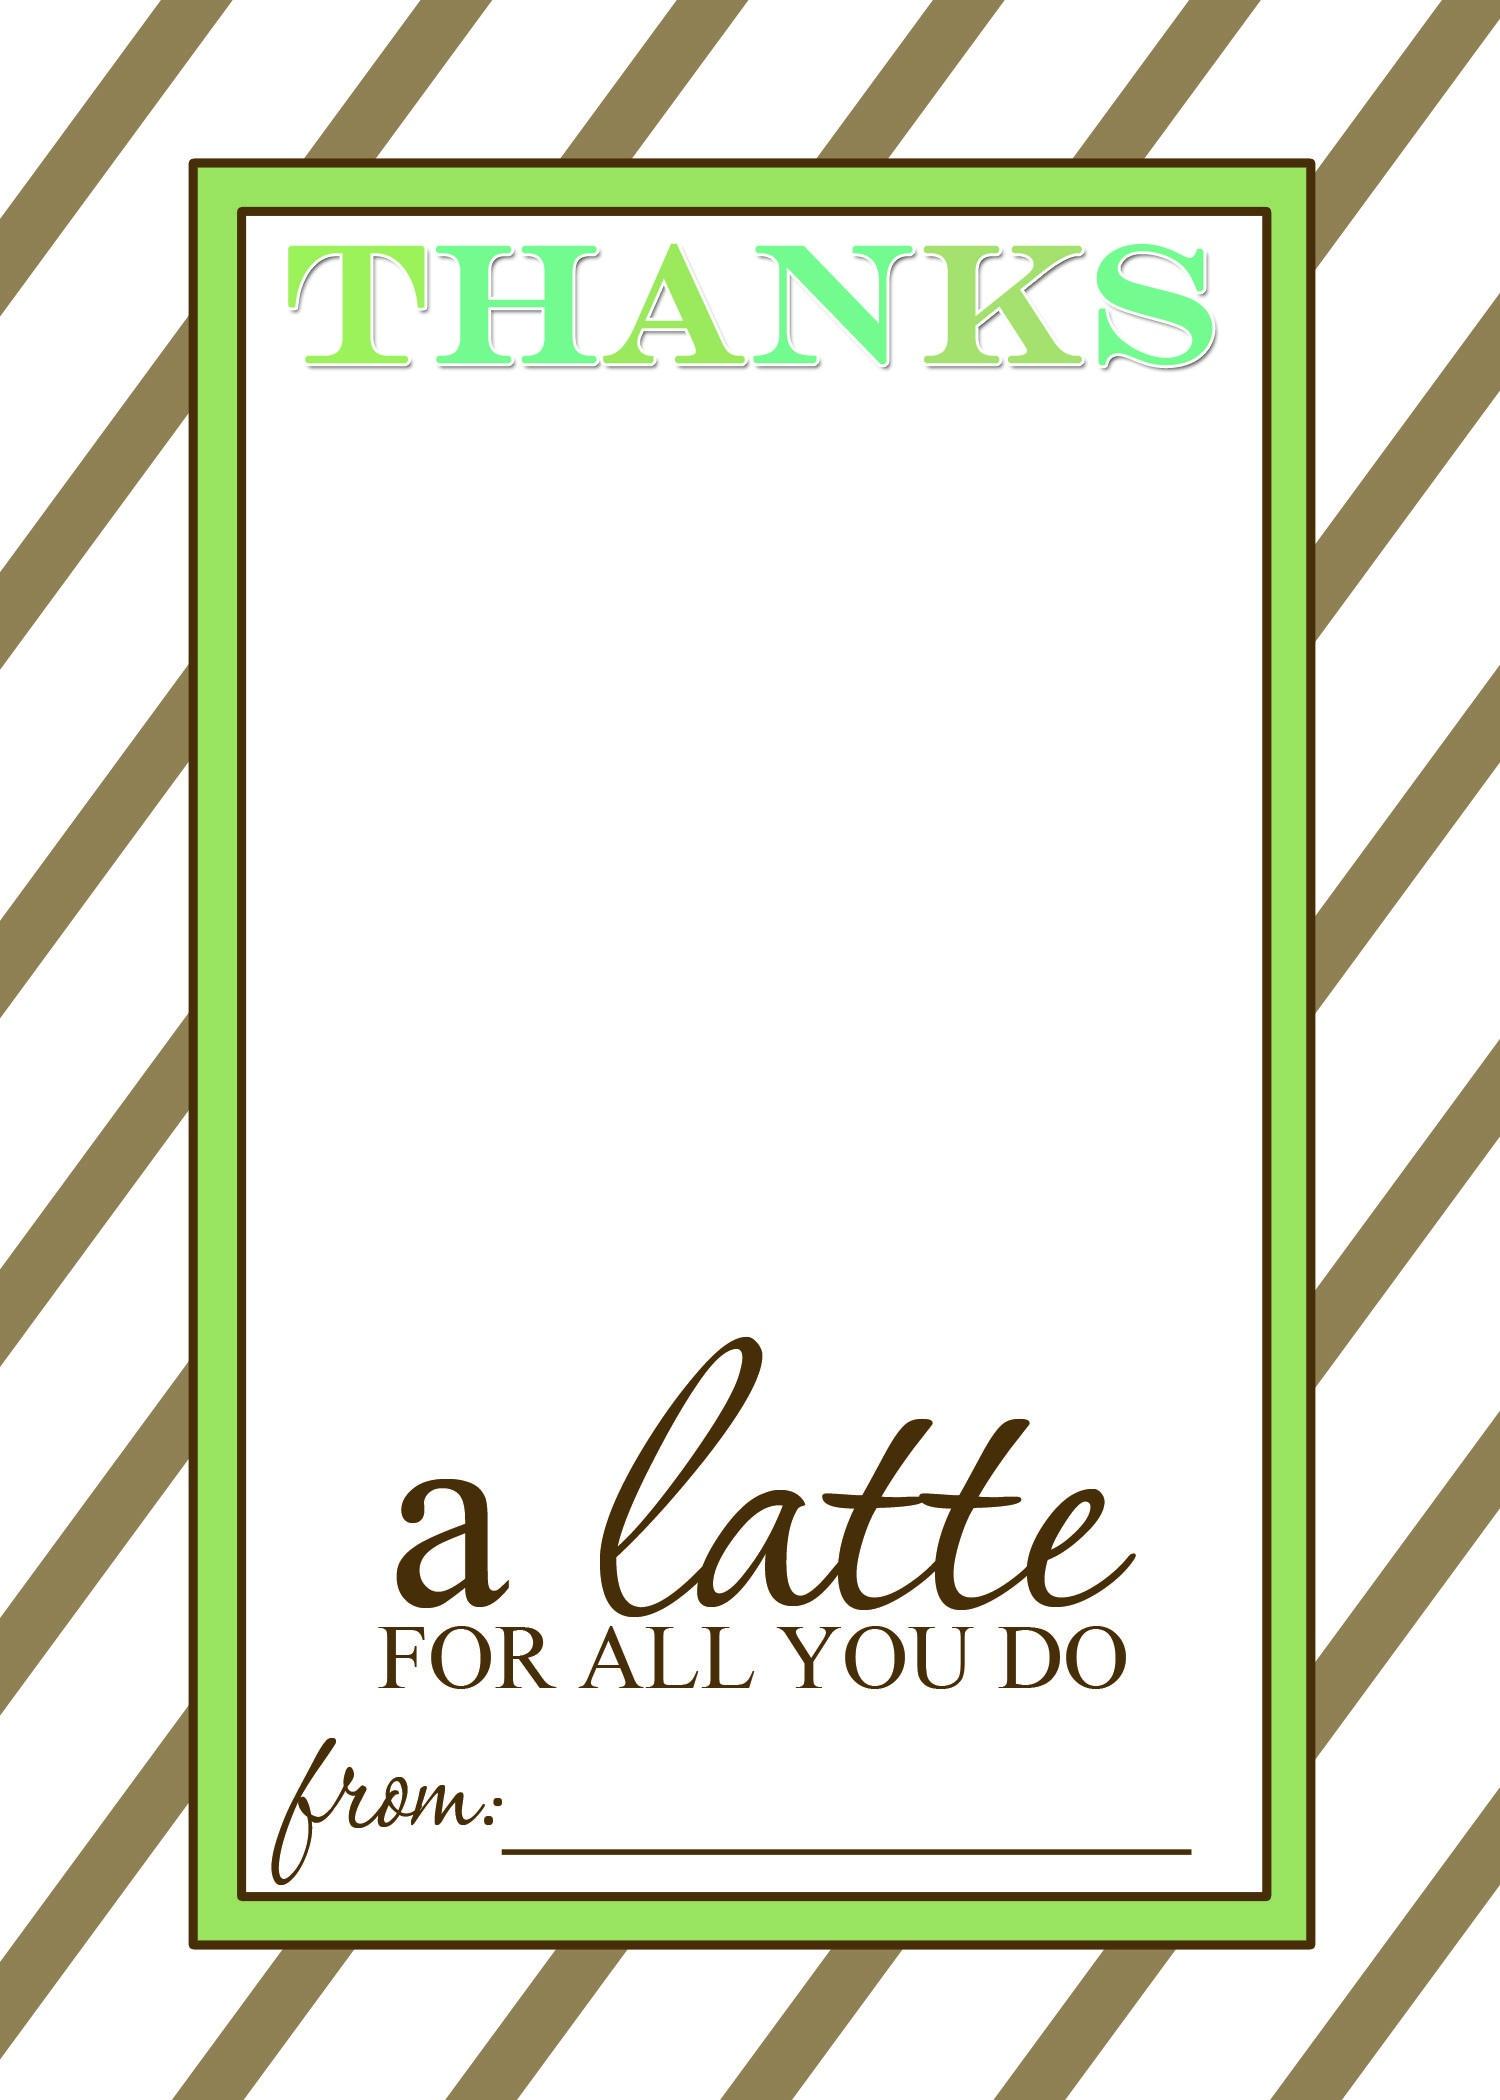 Thanks A Latte Free Printable Gift Card Holder Teacher Gift | Las - Thanks A Latte Free Printable Card